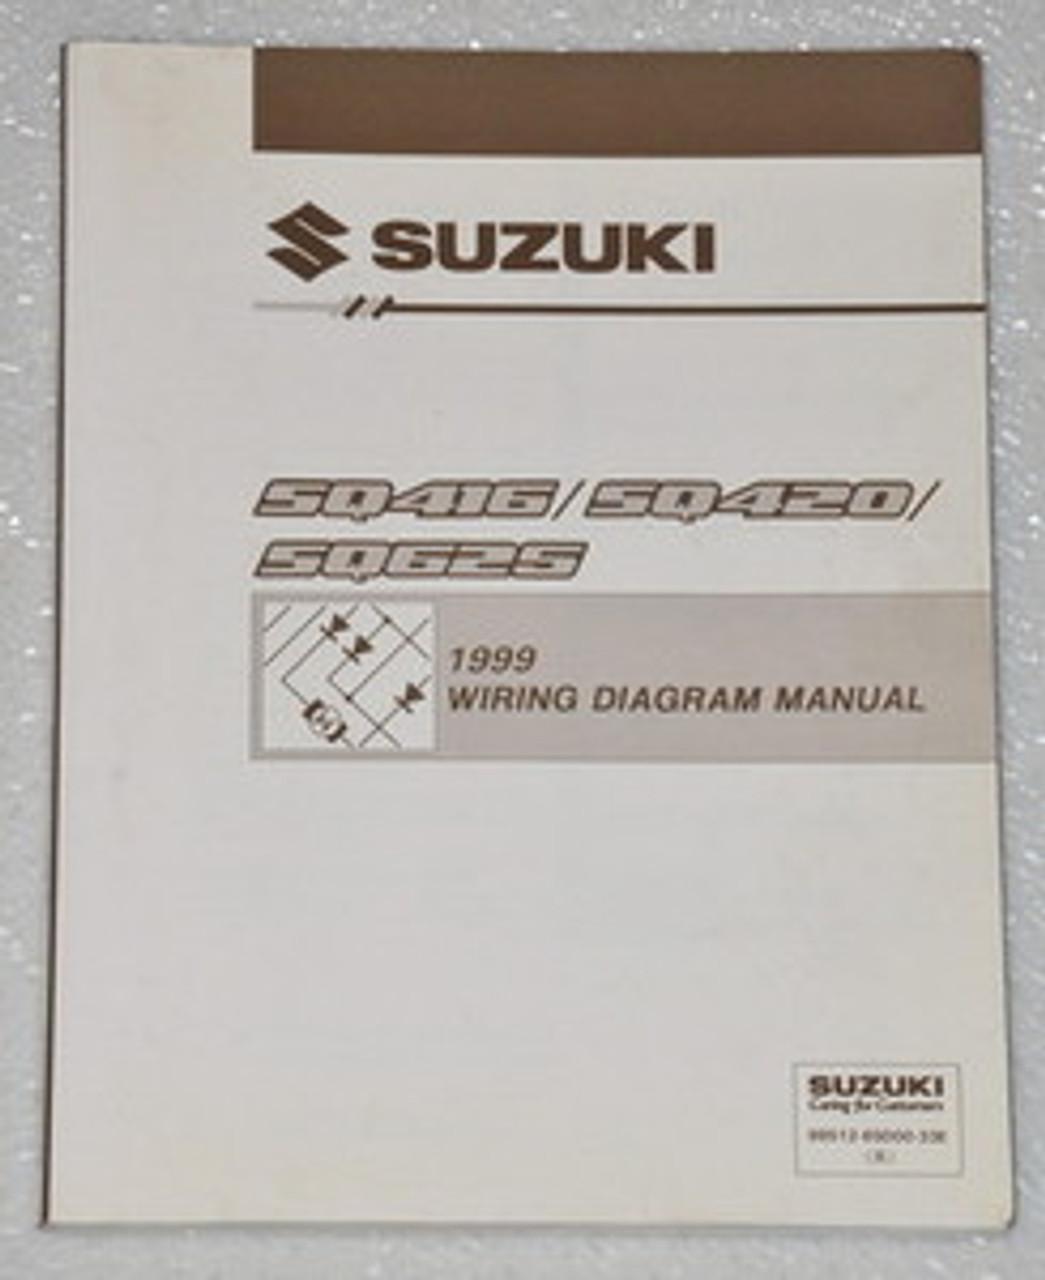 Suzuki Jimny 1999 Wiring Diagram